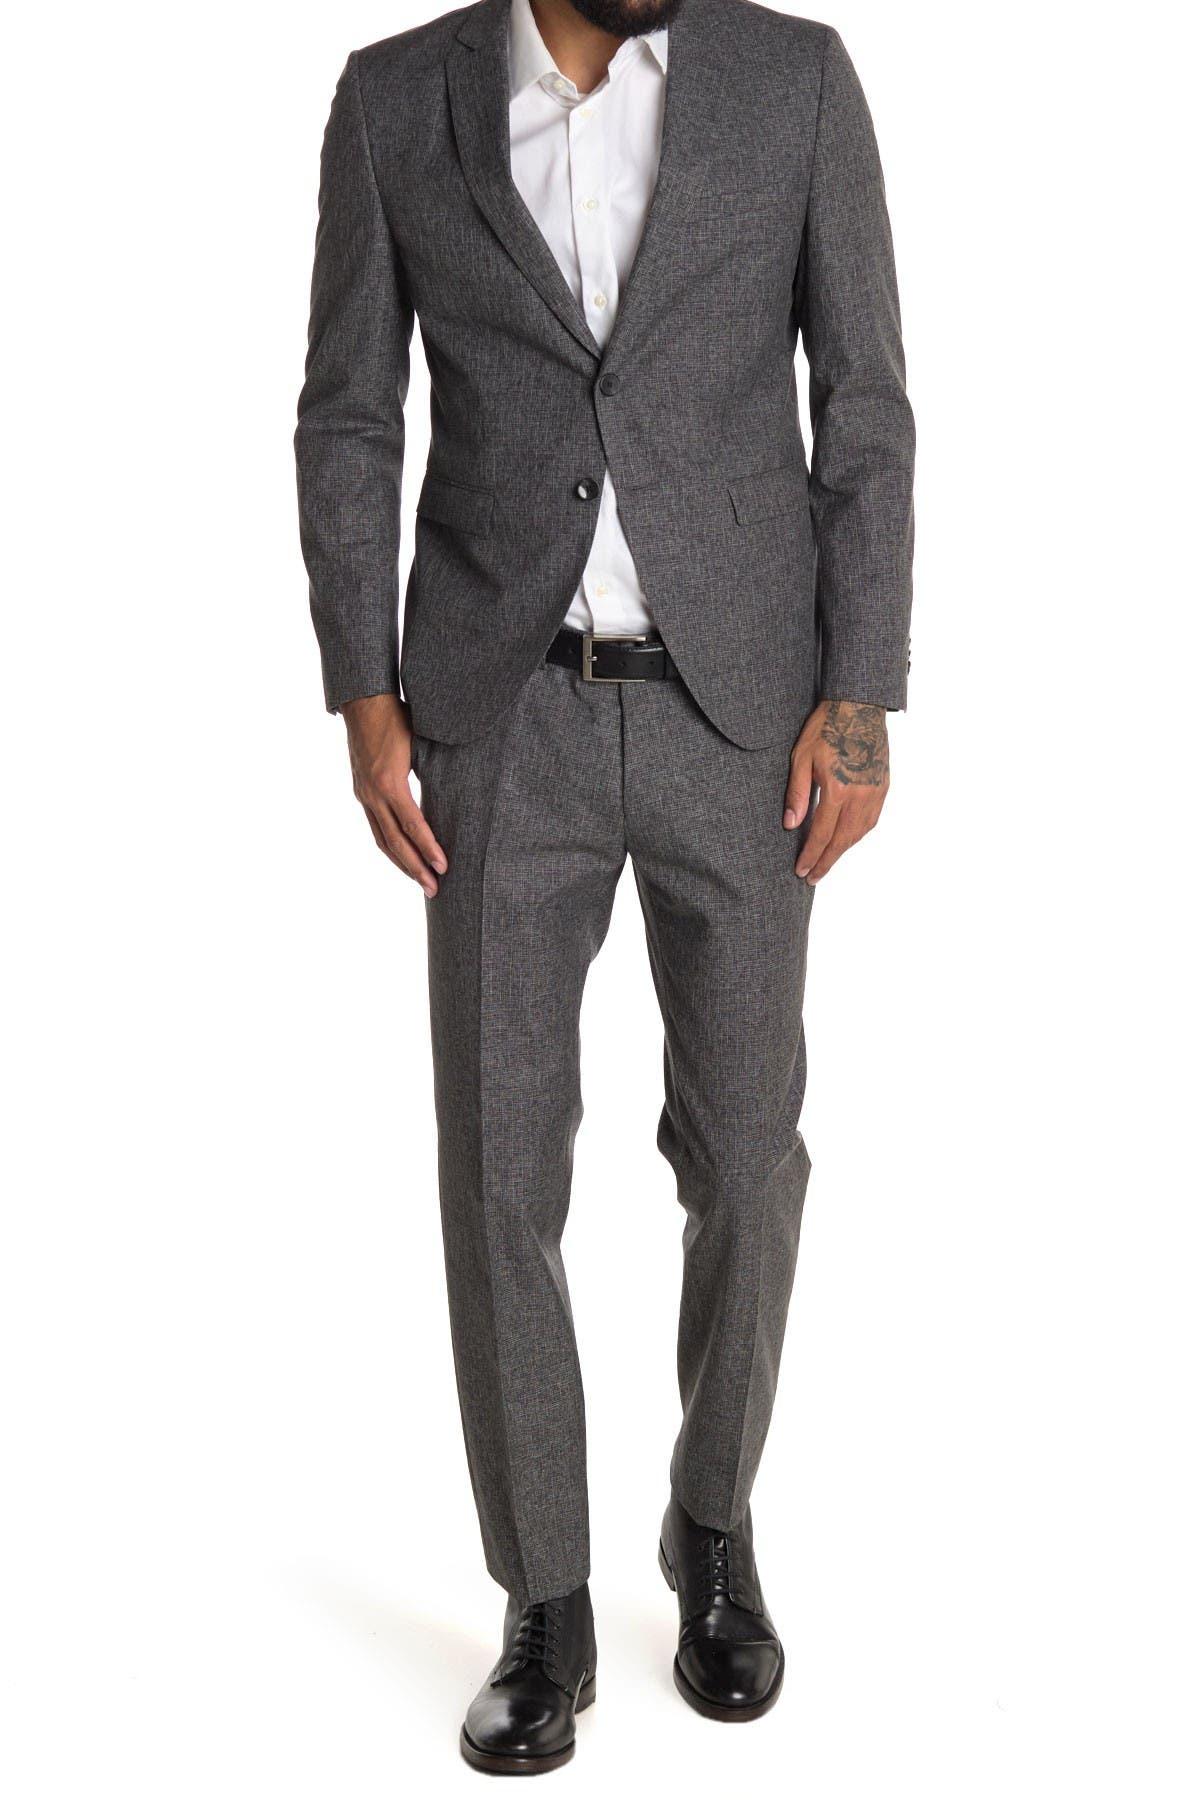 Image of BOSS Reymond Grey Sharkskin Two Button Notch Lapel Suit